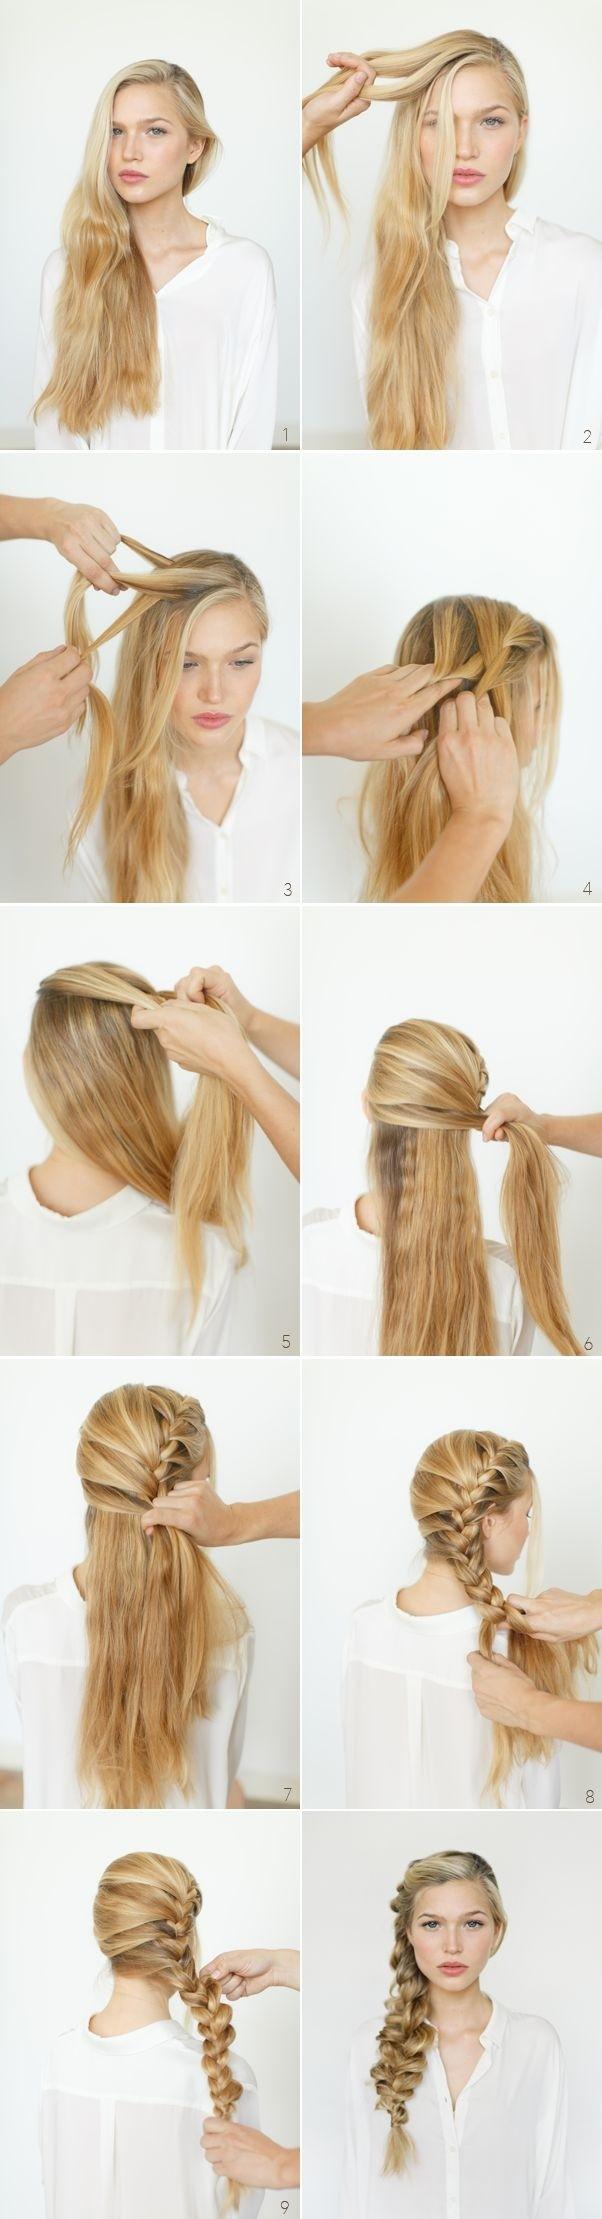 Groovy 10 Amazing Braided Hairstyles For Long Hair Pretty Designs Short Hairstyles Gunalazisus